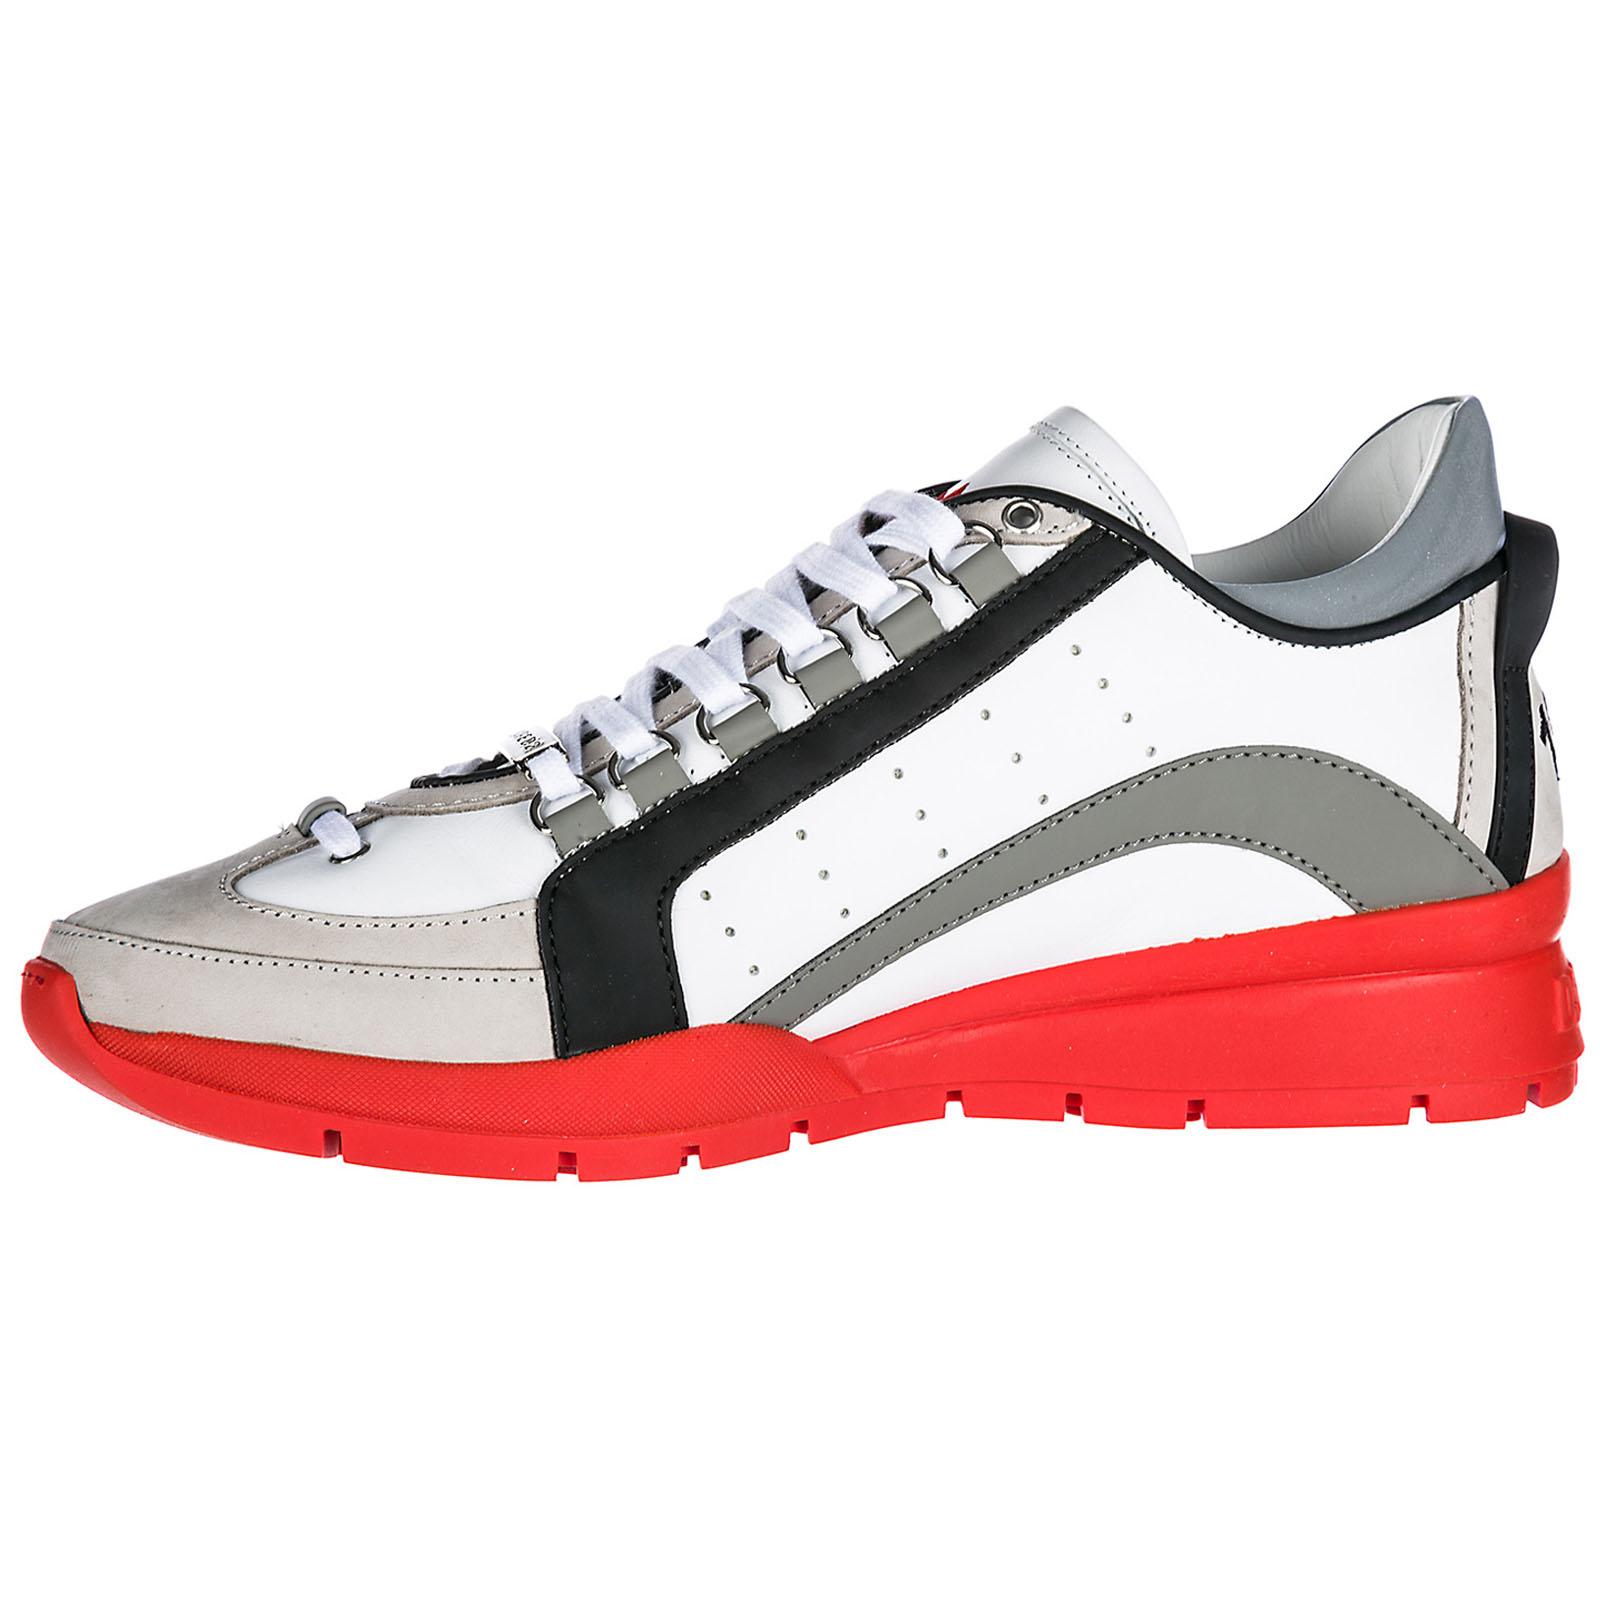 Nuevos Estilos Descuento Fotos Dsquared2 Scarpe Sneakers Uomo in Pelle  Nuove 551 Bianco EU 41 SNM040406500413M043 a78a701a22bb